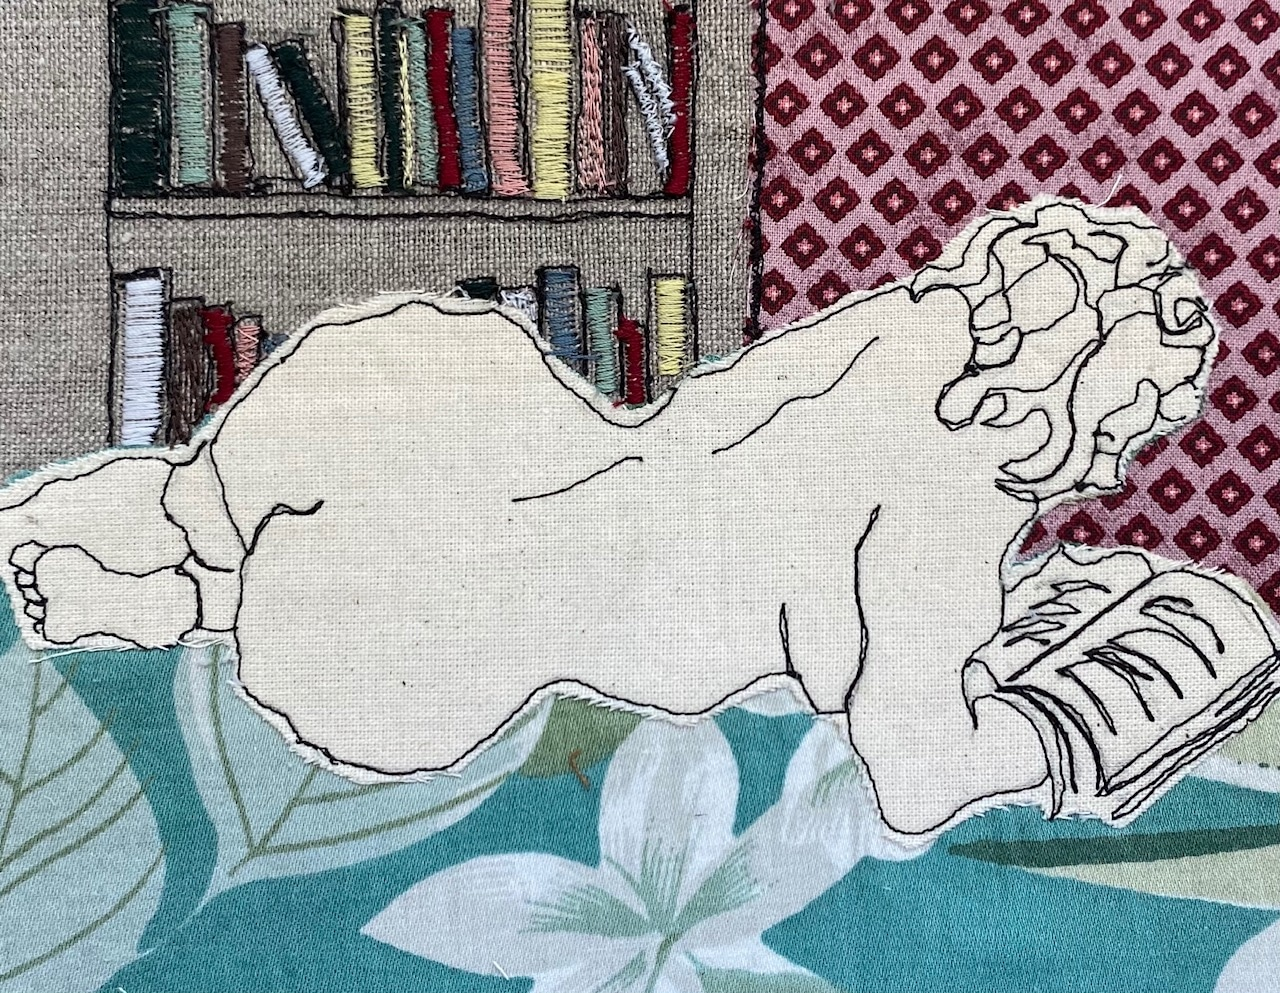 Booklover Embroidered Textile Artwork By Juliet D Collins (Prahran)